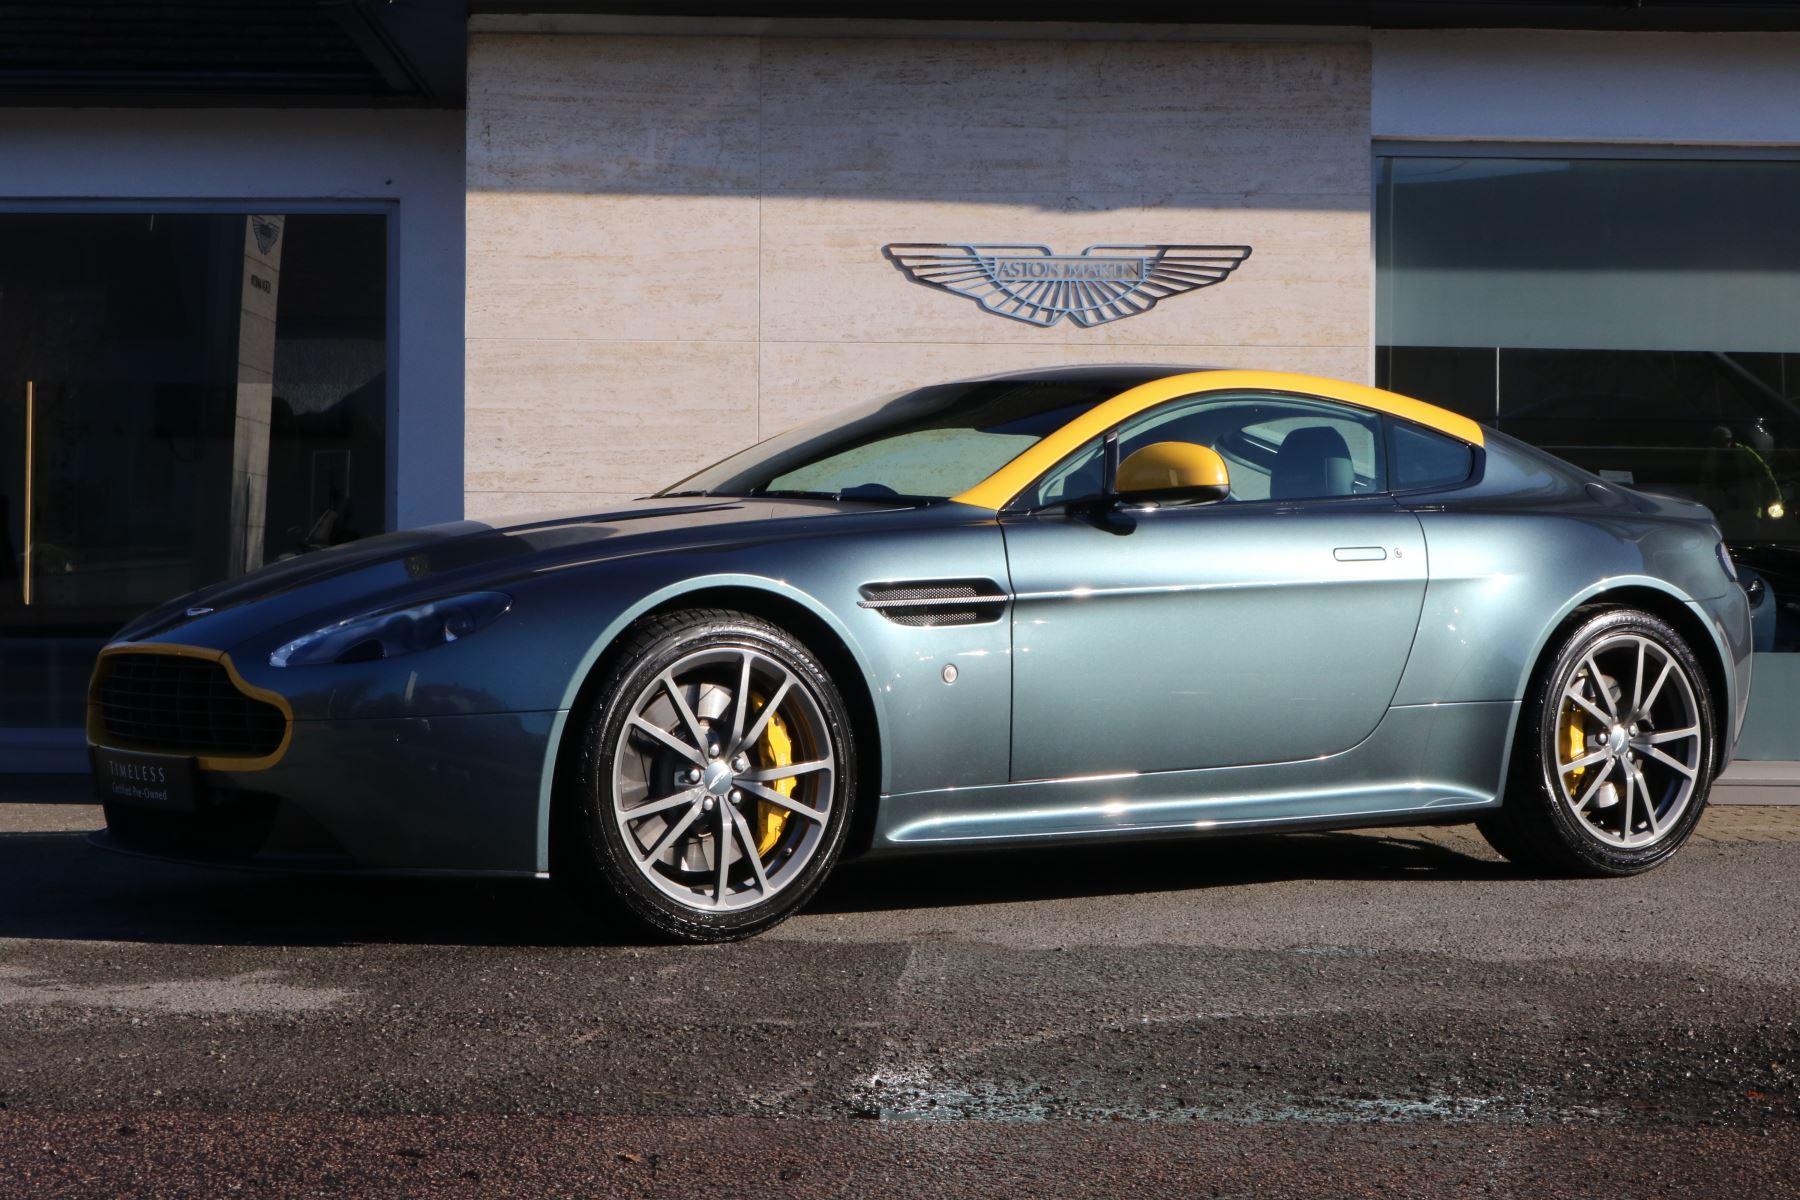 Aston Martin Vantage N430 N430 2dr 4.7 3 door Coupe (2015) image